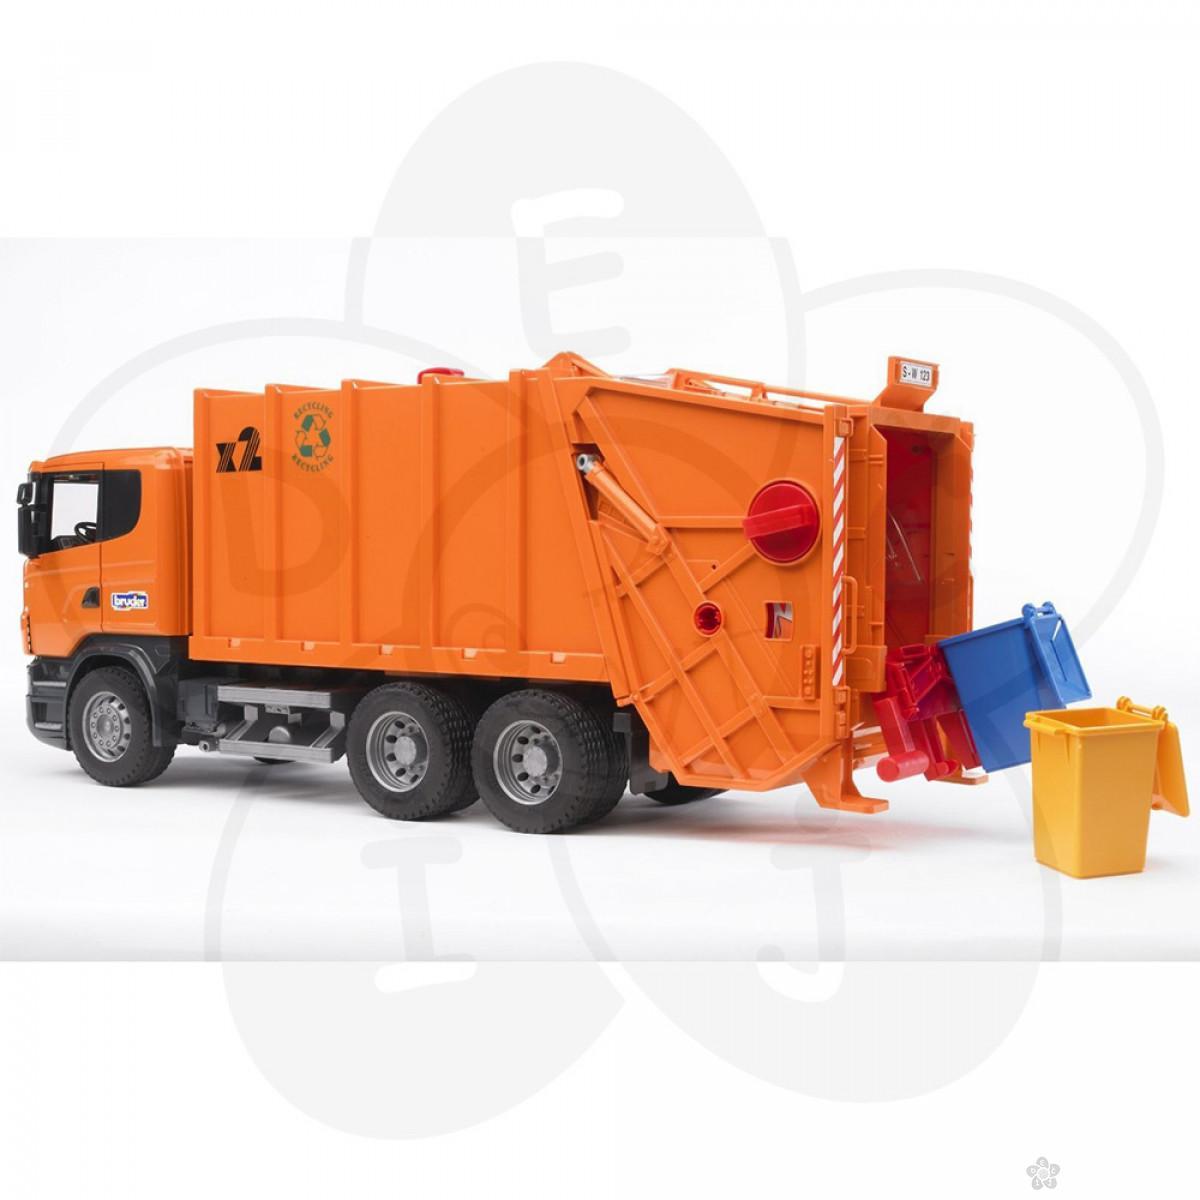 Kamion MB sprinter gradjevinski sa znakovima Bruder, 025373